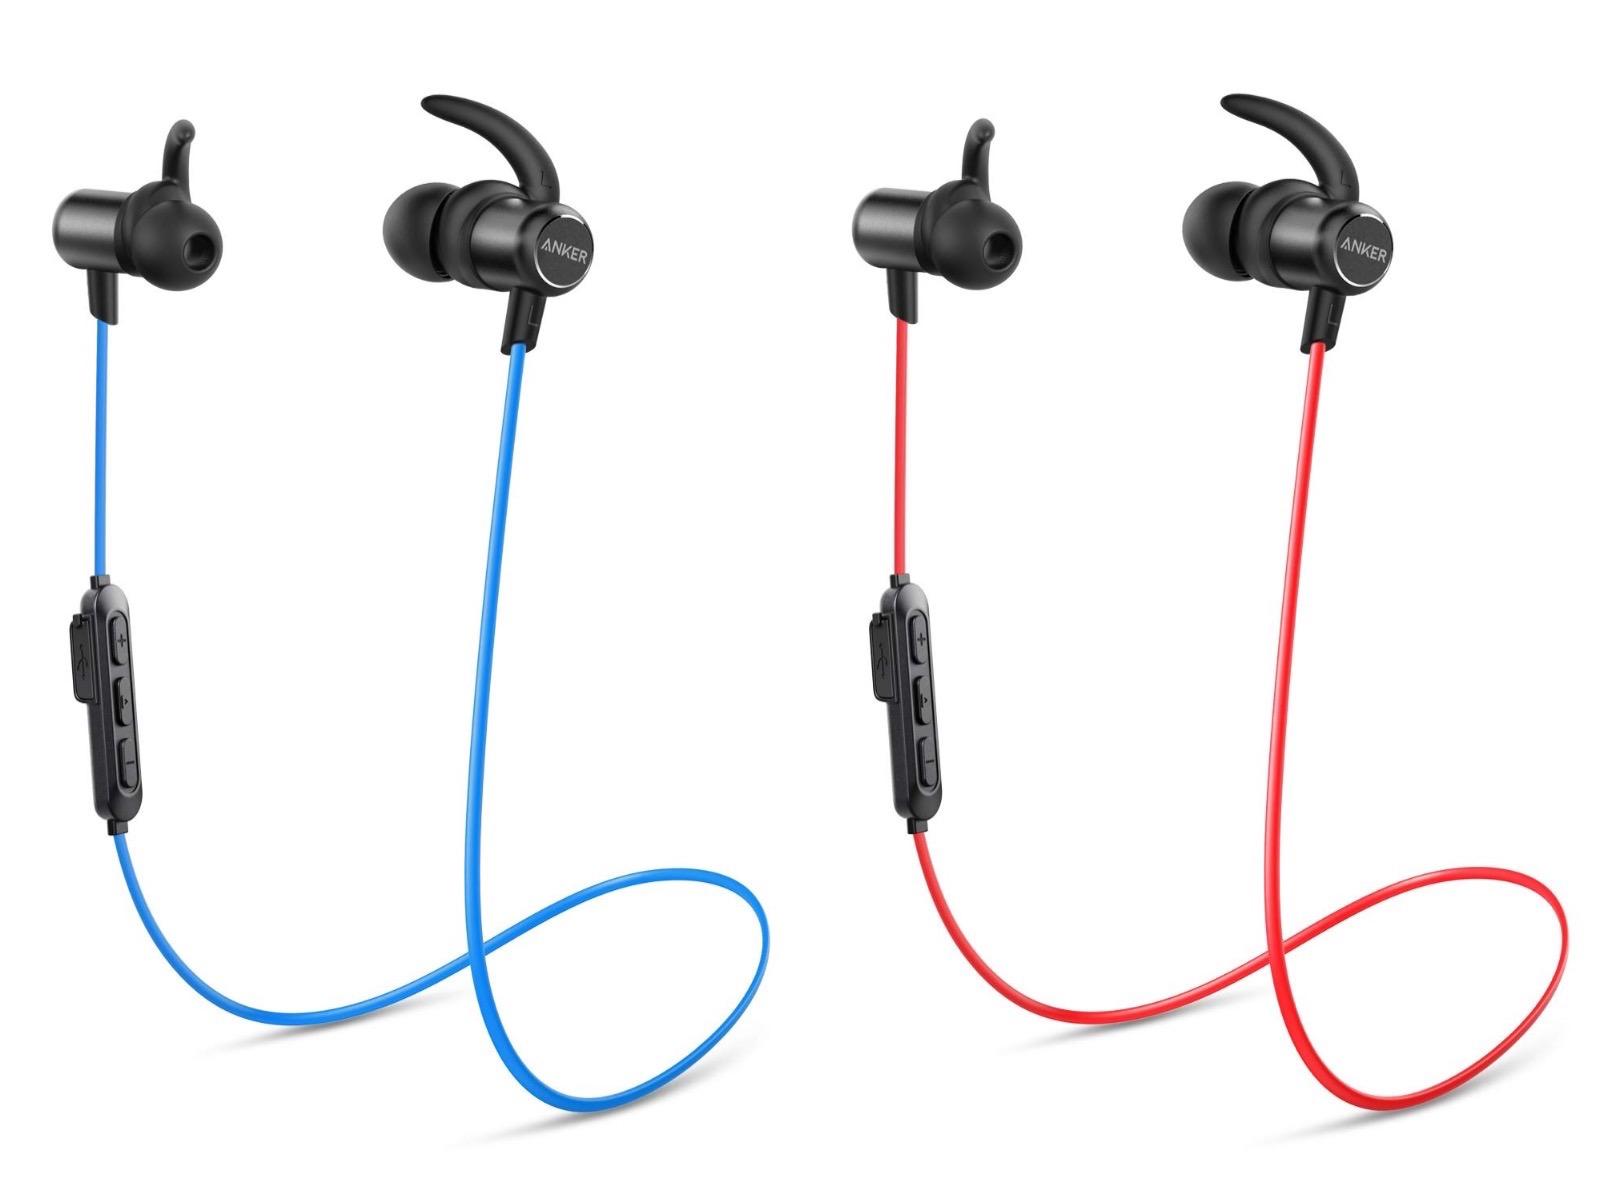 Anker-SoundBuds-Slim-2ndGen-Red-and-Blue.jpg